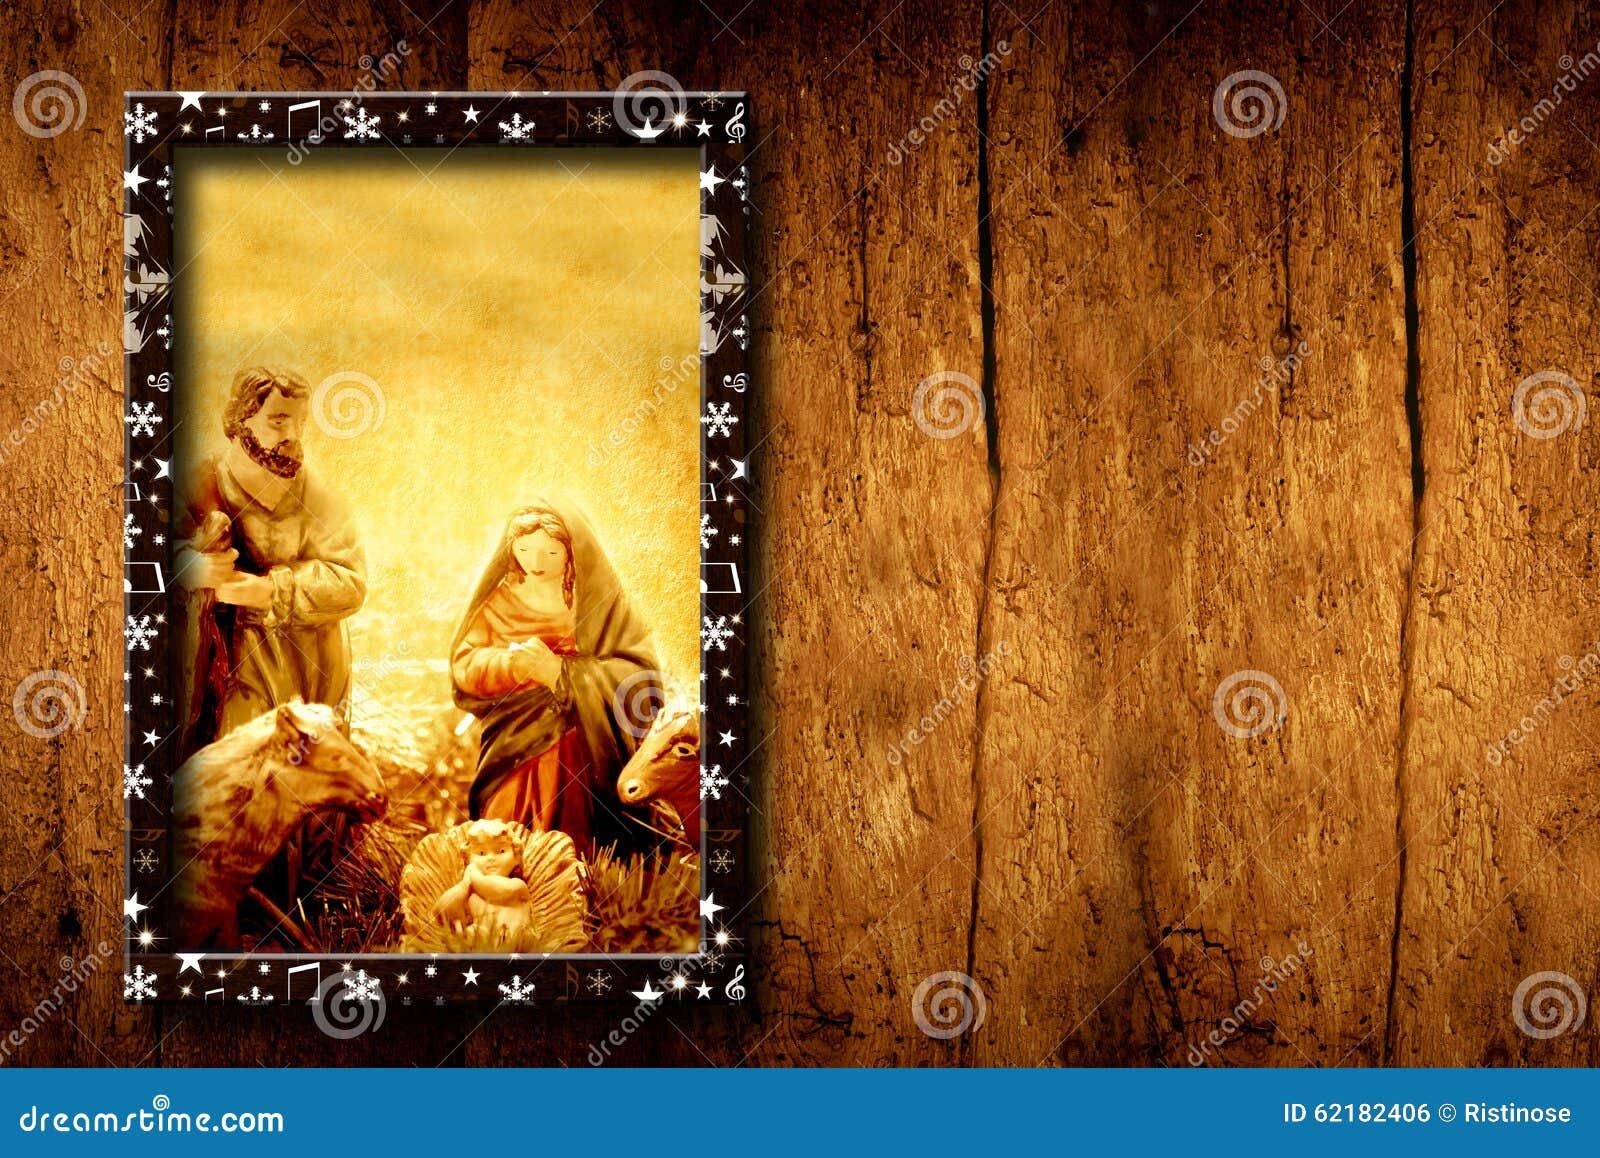 chrristmas templates nativity scene stock photo image of